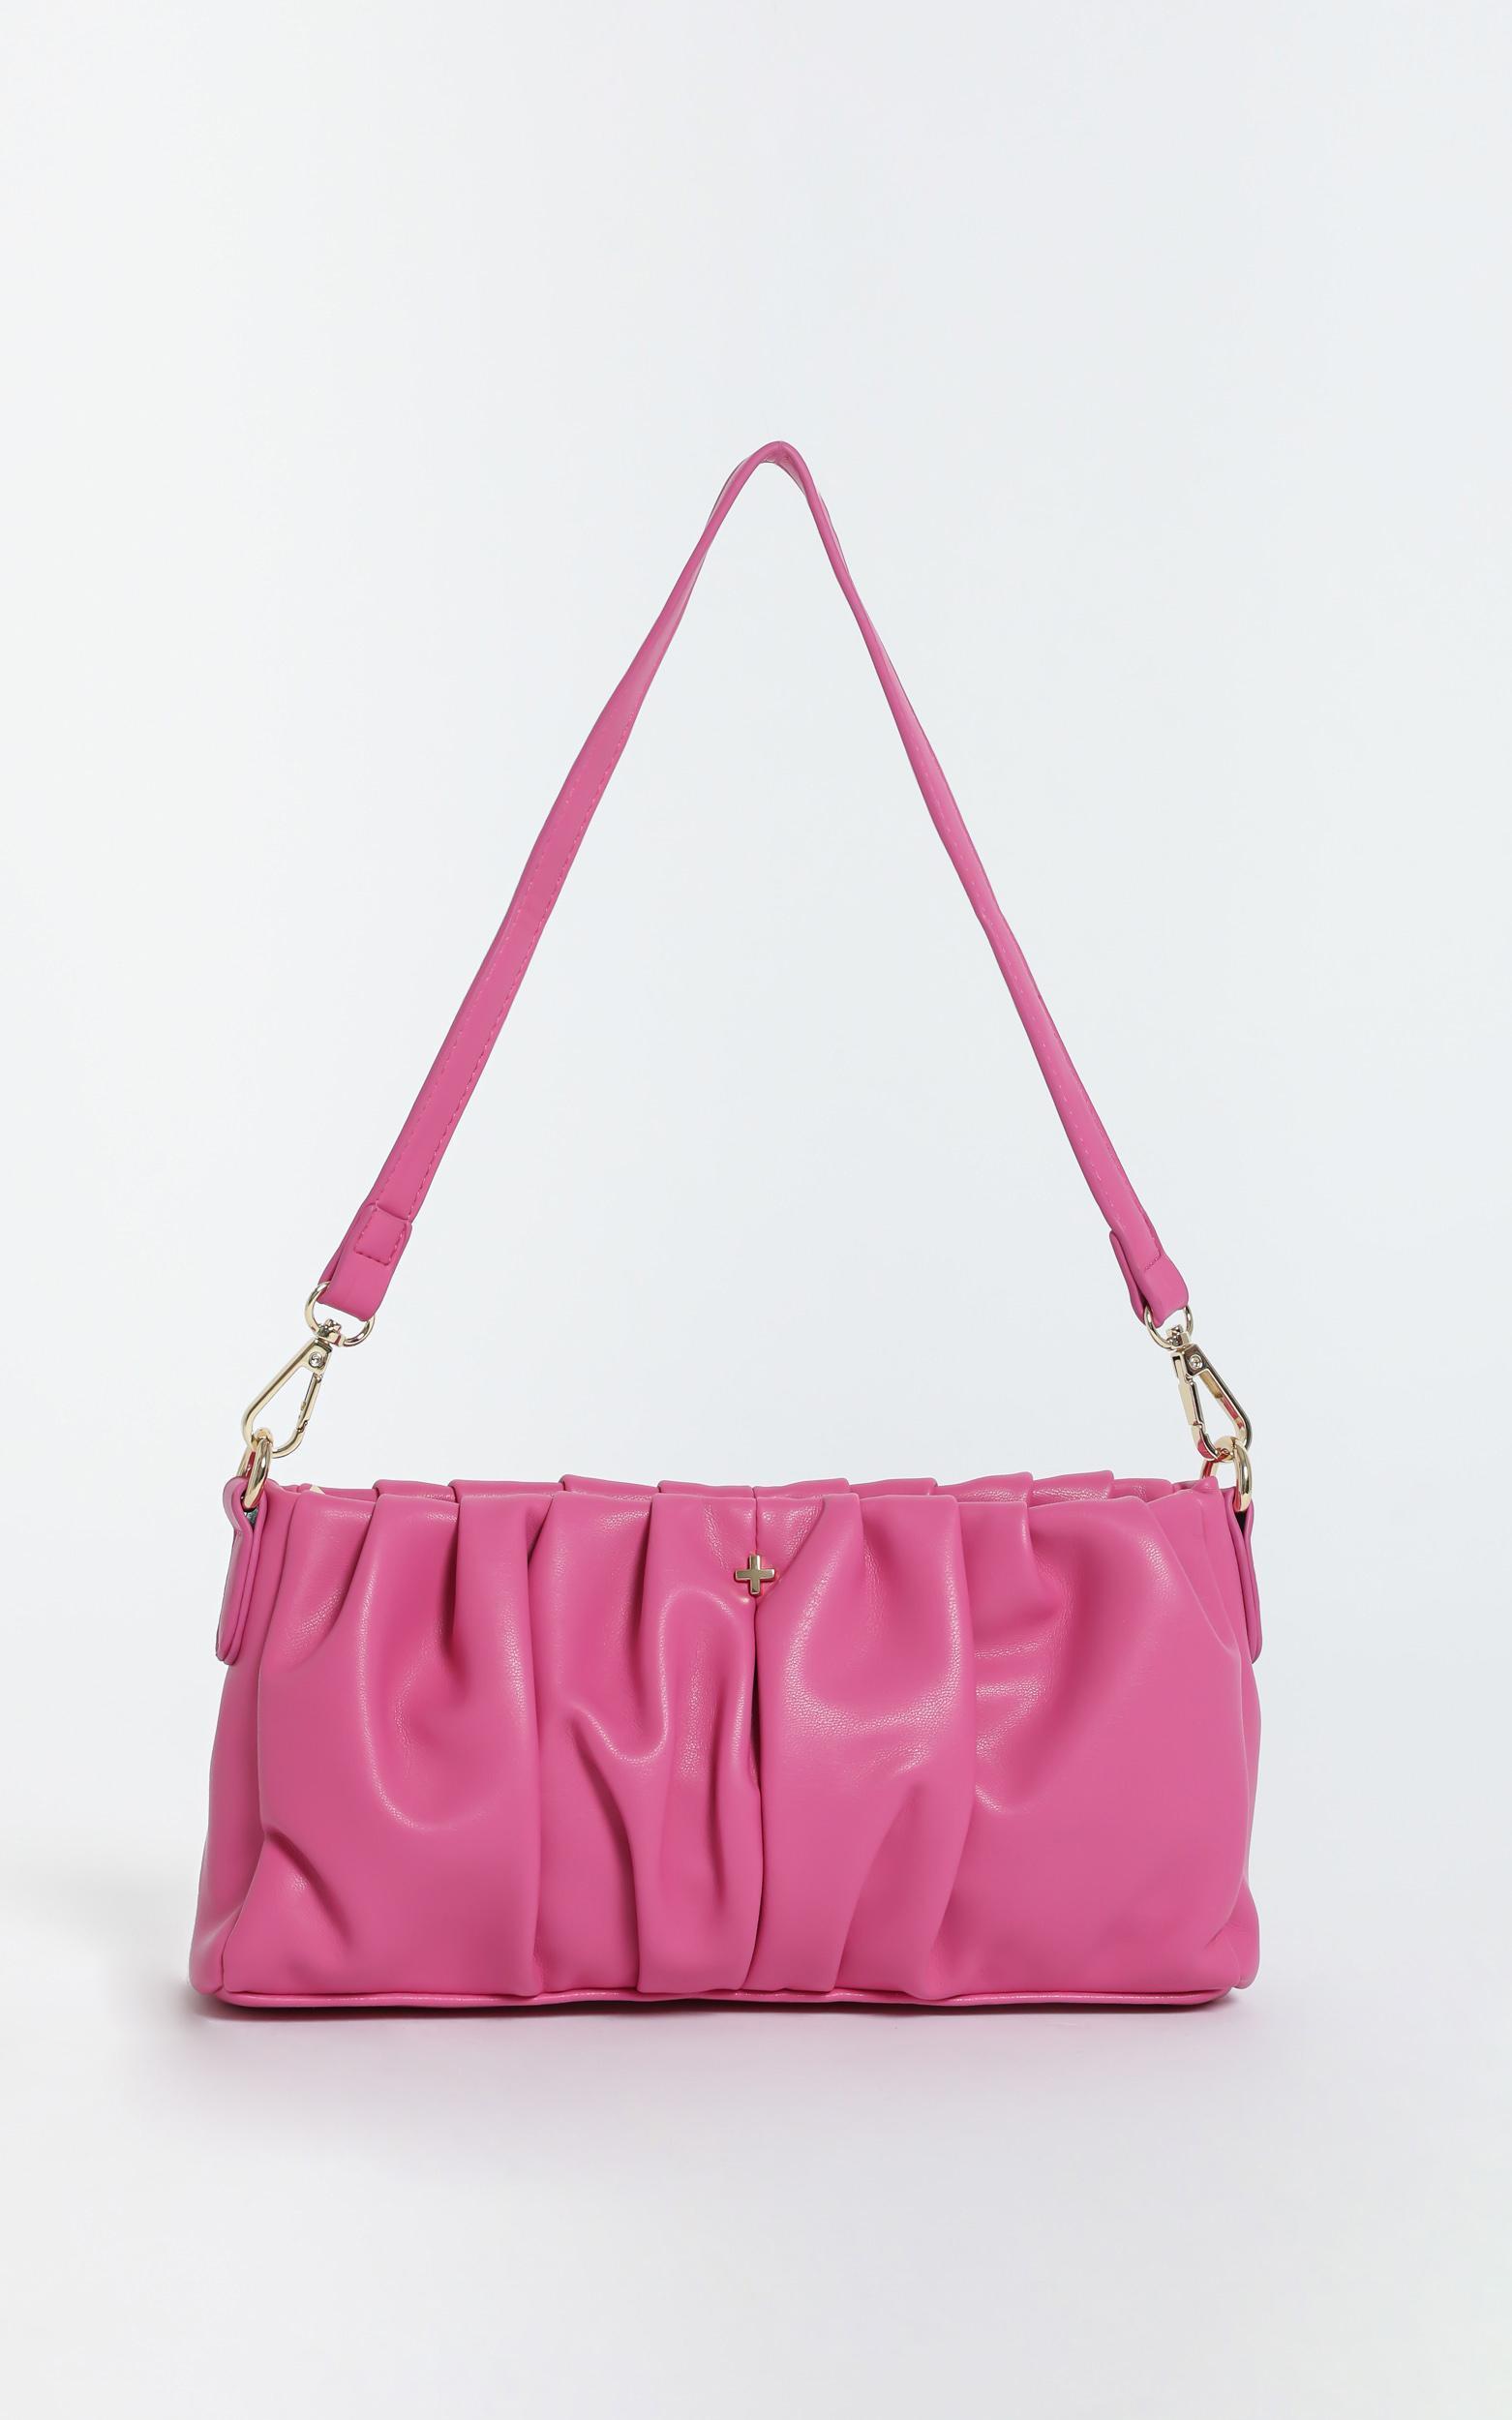 Peta and Jain - Ryder Bag in Hot Pink, , hi-res image number null